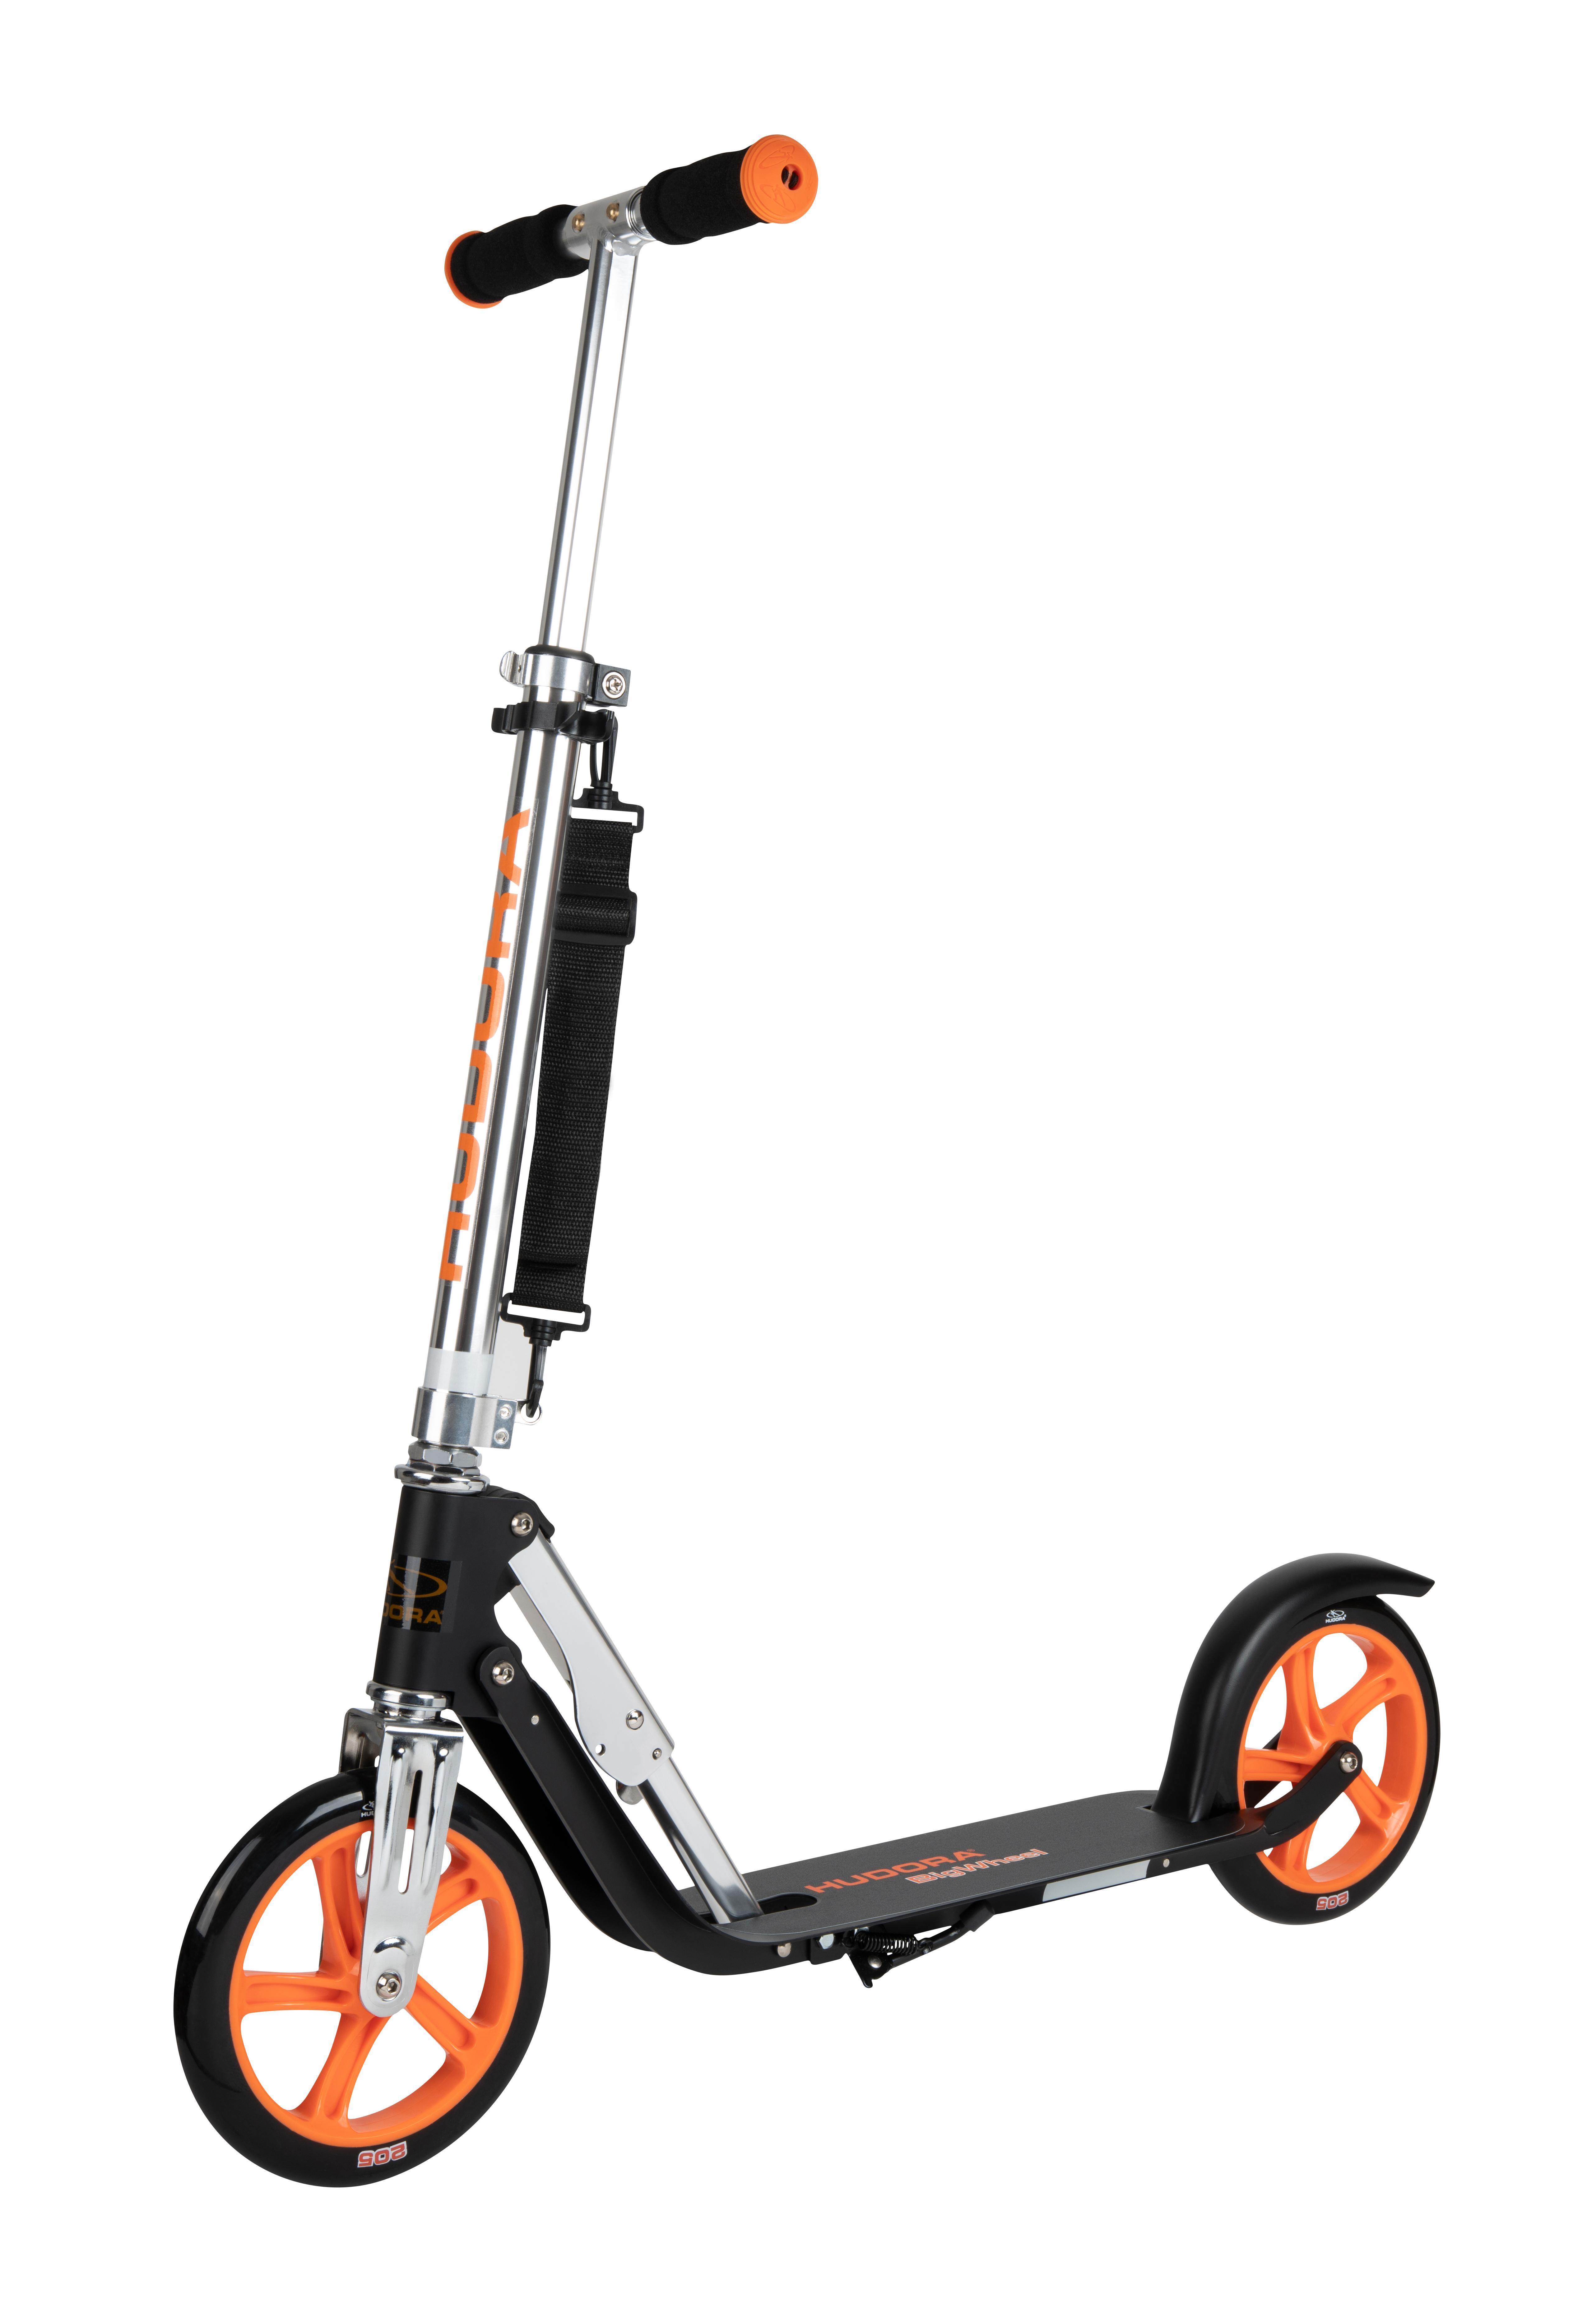 Hudora Scooter   Roller Roller Roller Big Wheel RX 205 Low Rider + Lenkerlicht + Kabelschloss 3b1738